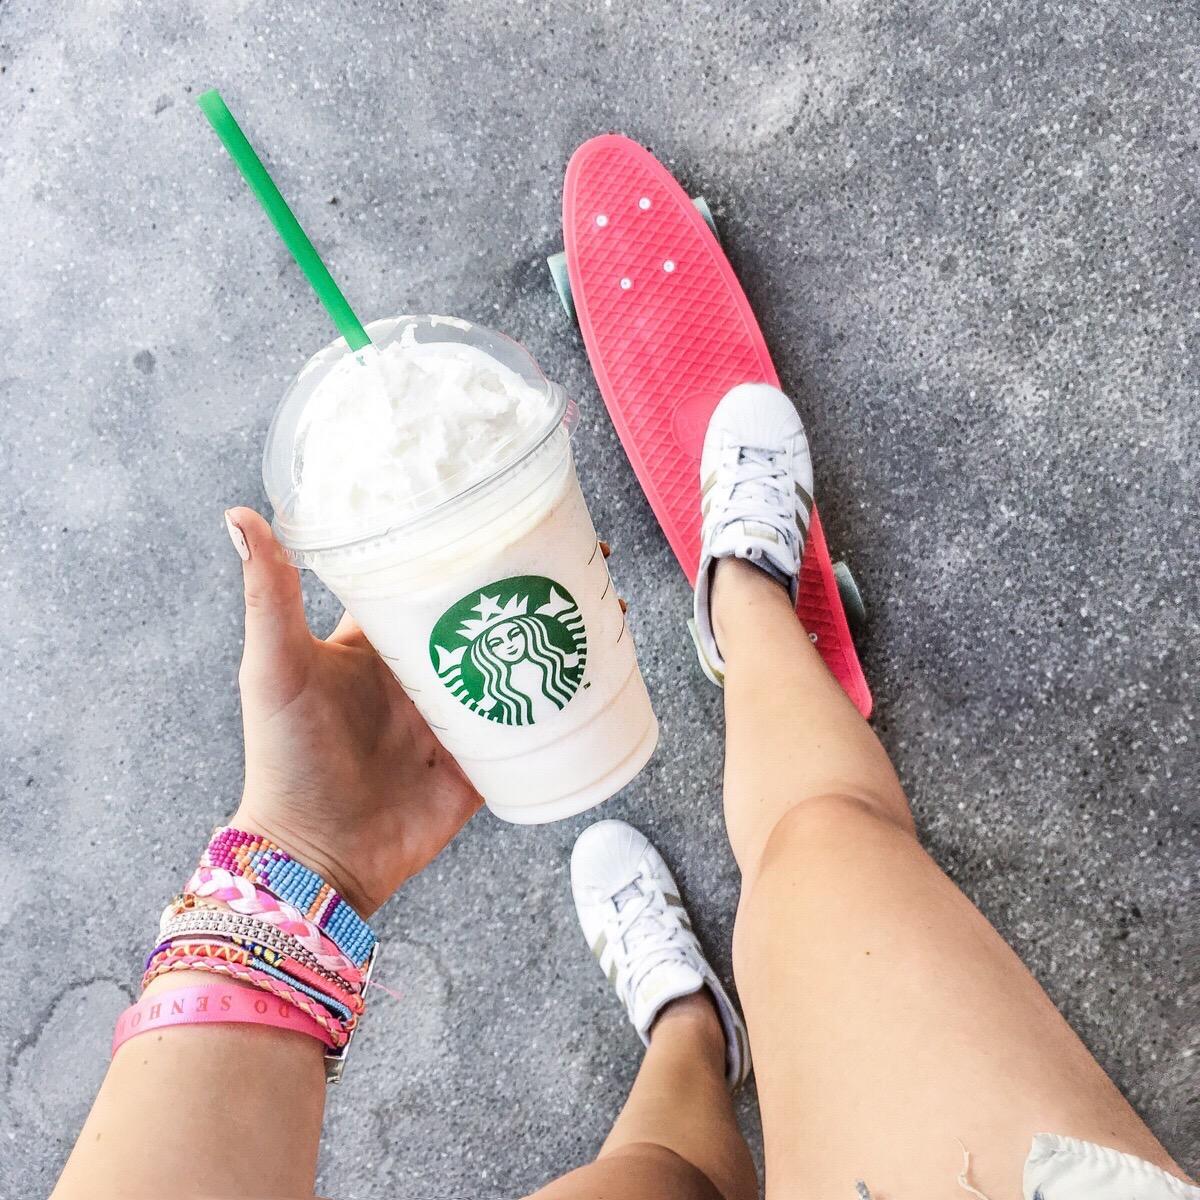 Franziska Elea deutsche Blogger Penny Board Skateboard pink Inspo Starbucks Frappuccino Modeblog München Fashionblog Inspiration Adidas Superstar